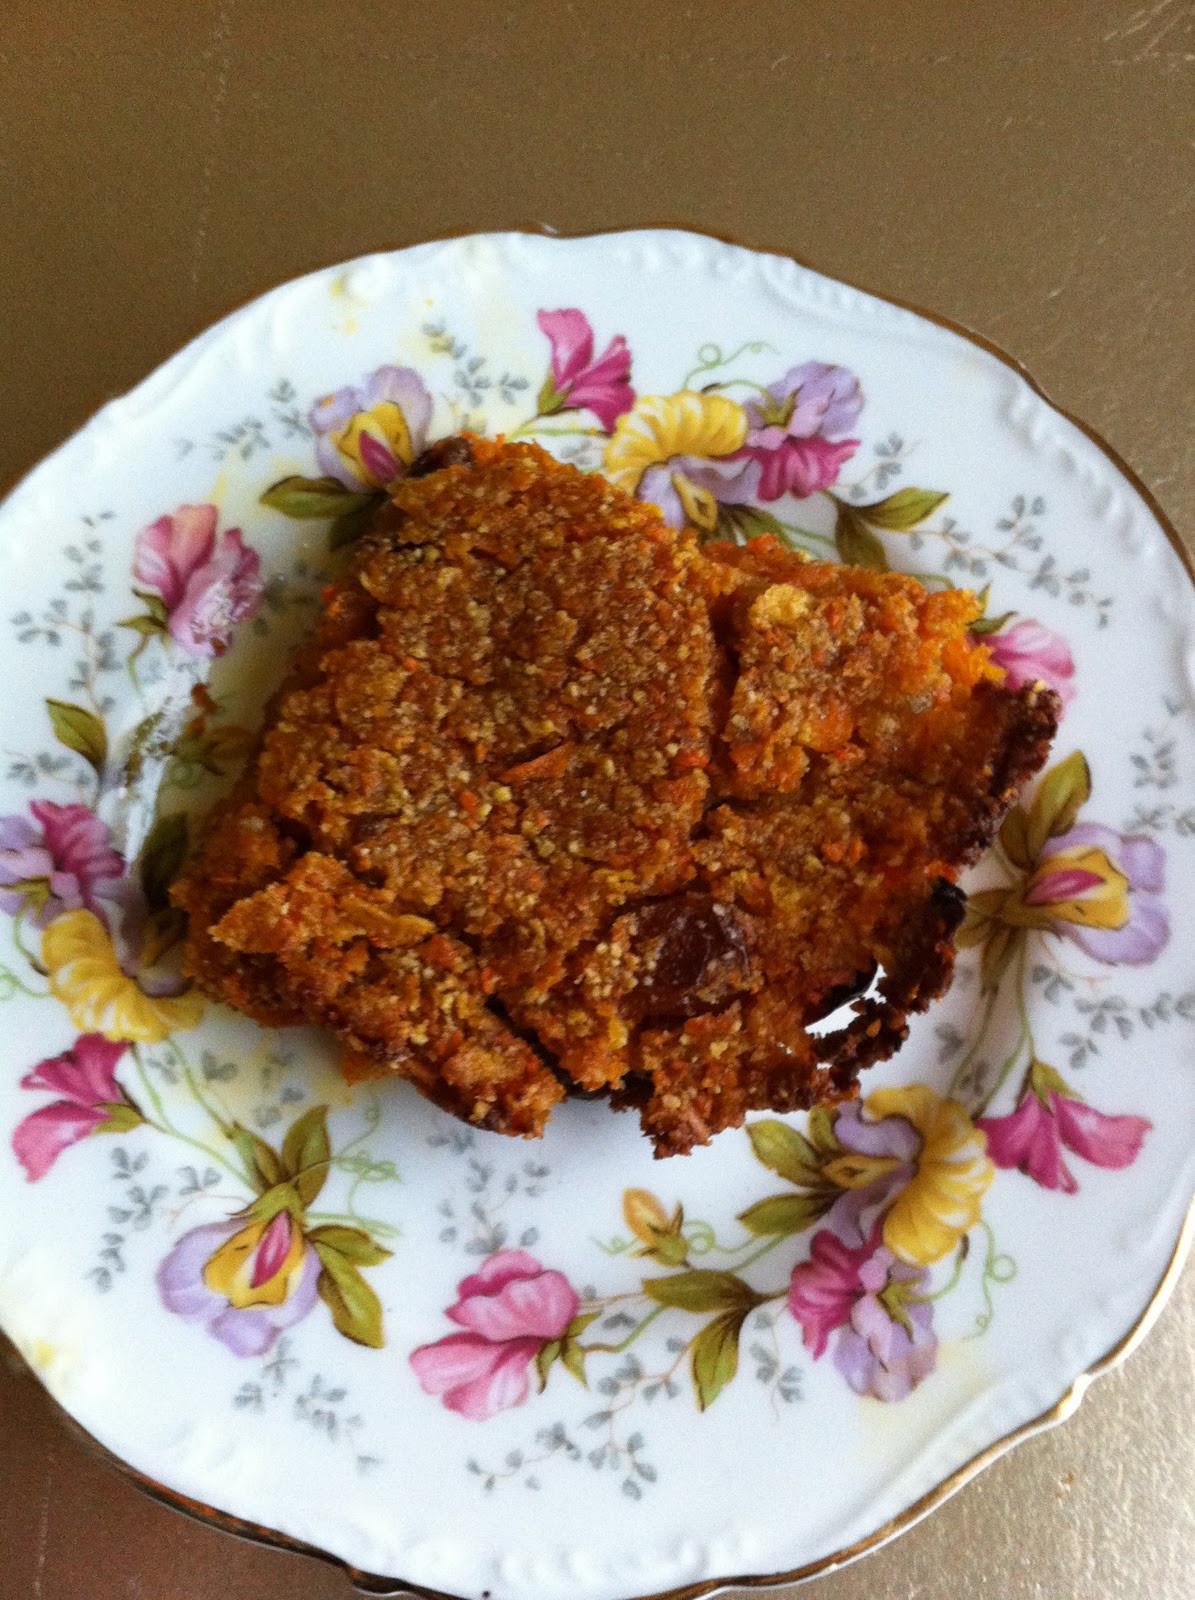 Passover Vegan Recipes  Passover Sweet Potato Kugel – Lisa s Project Vegan